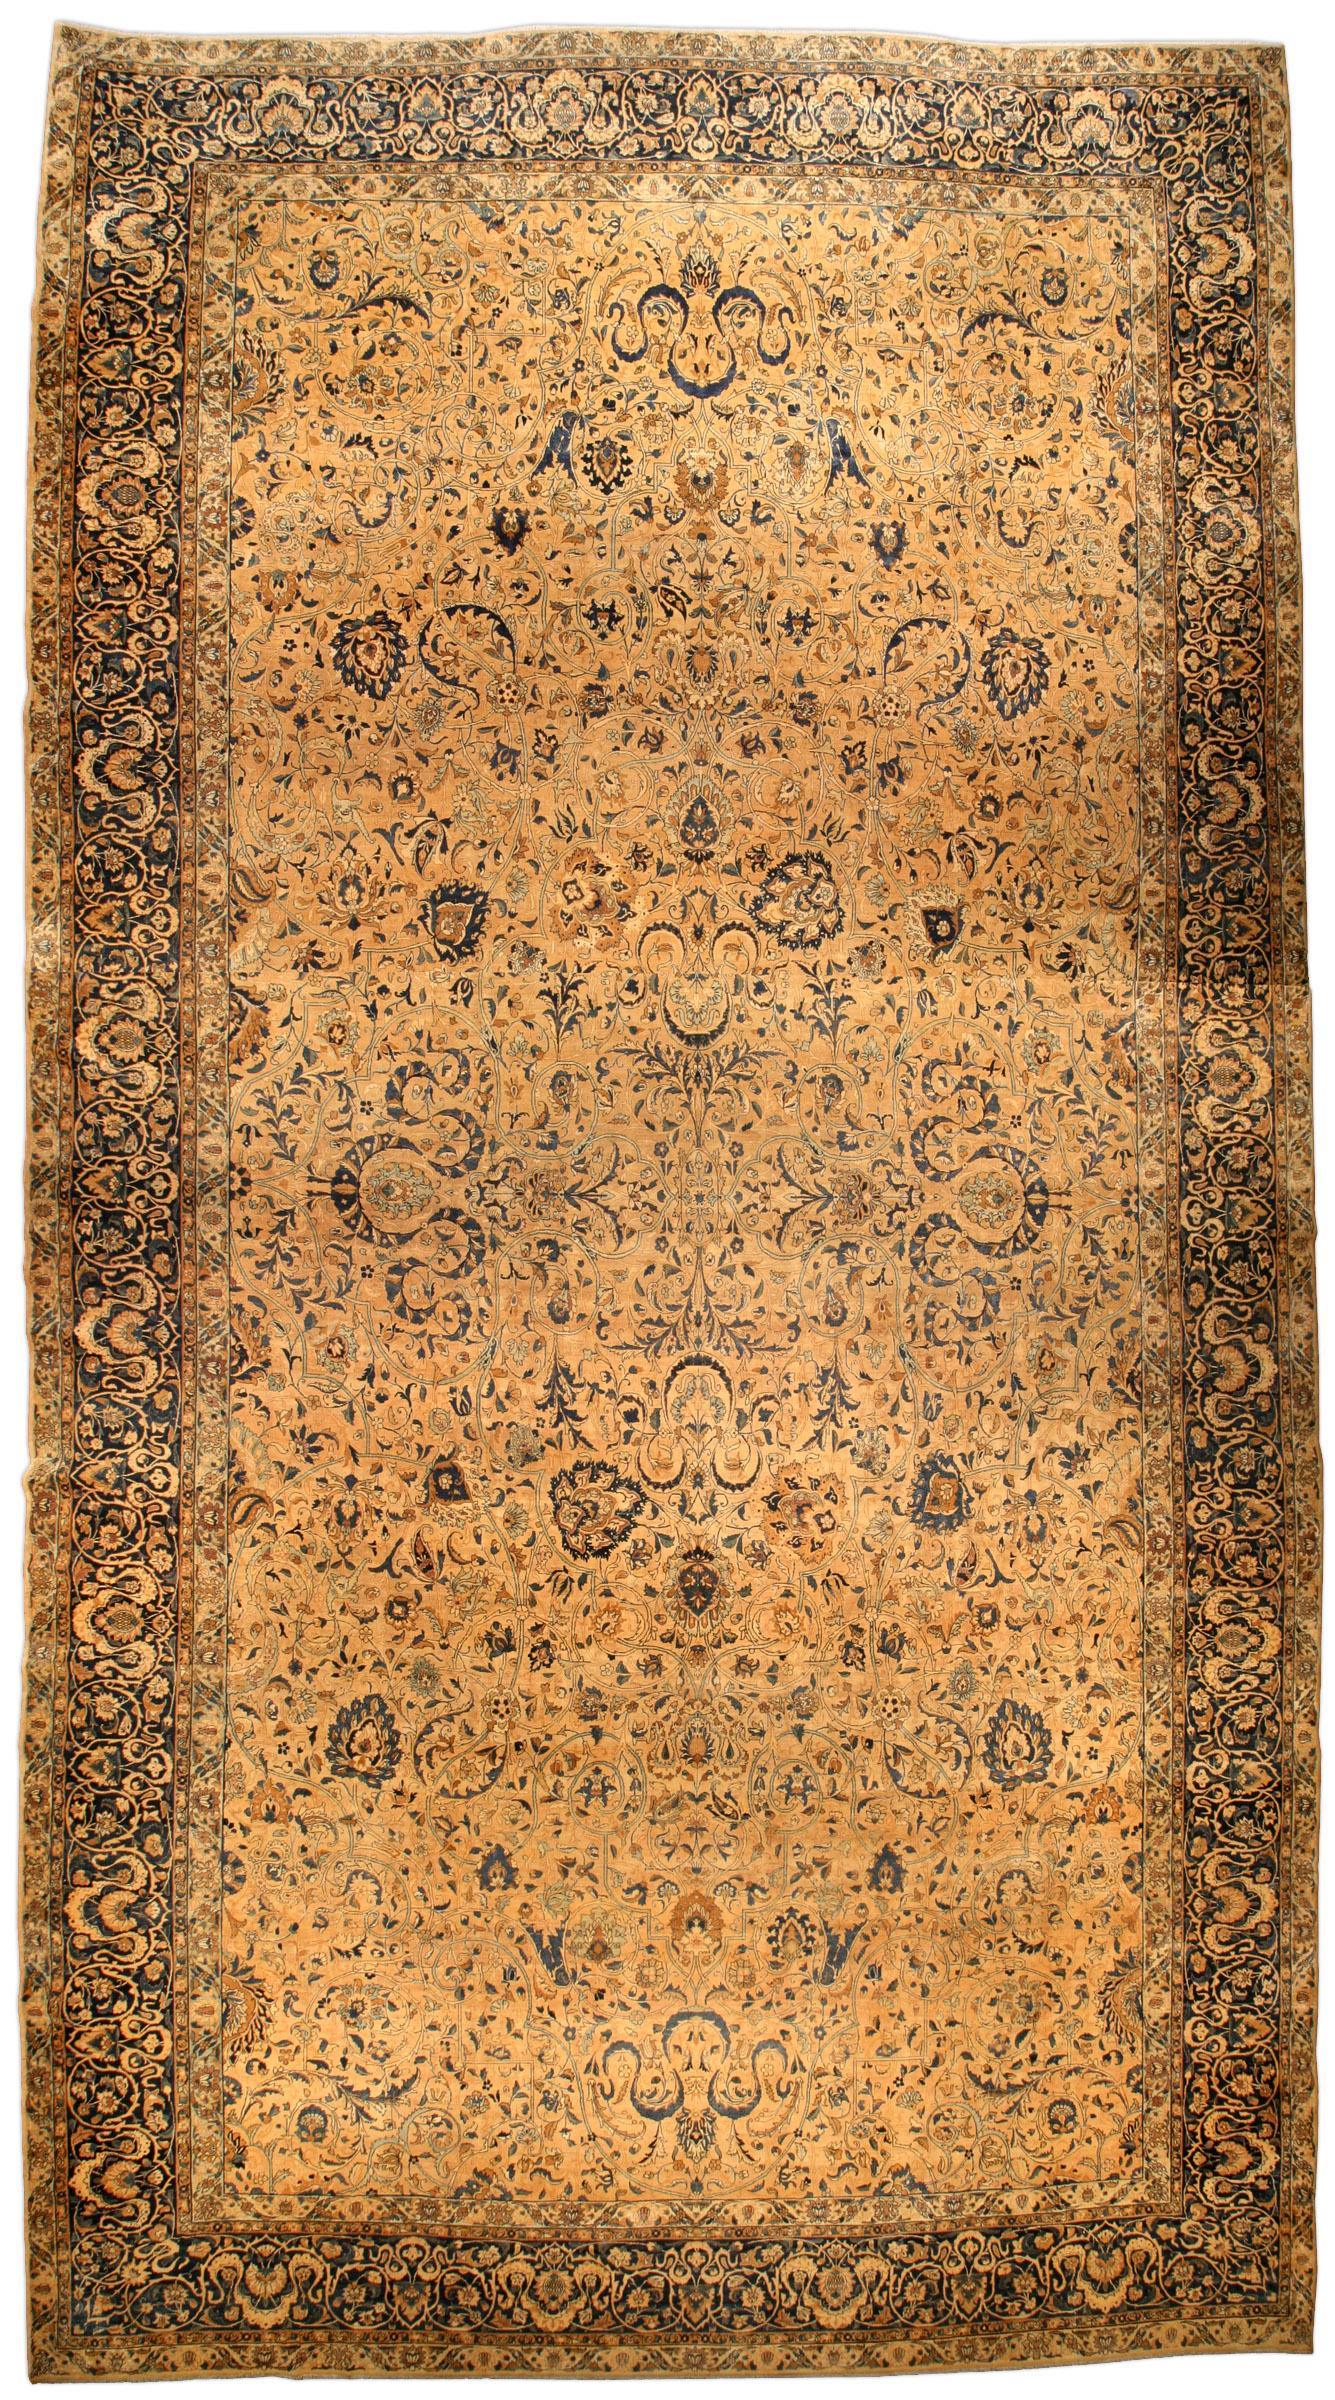 Oversized Antique Persian Kirman Carpet BB4201